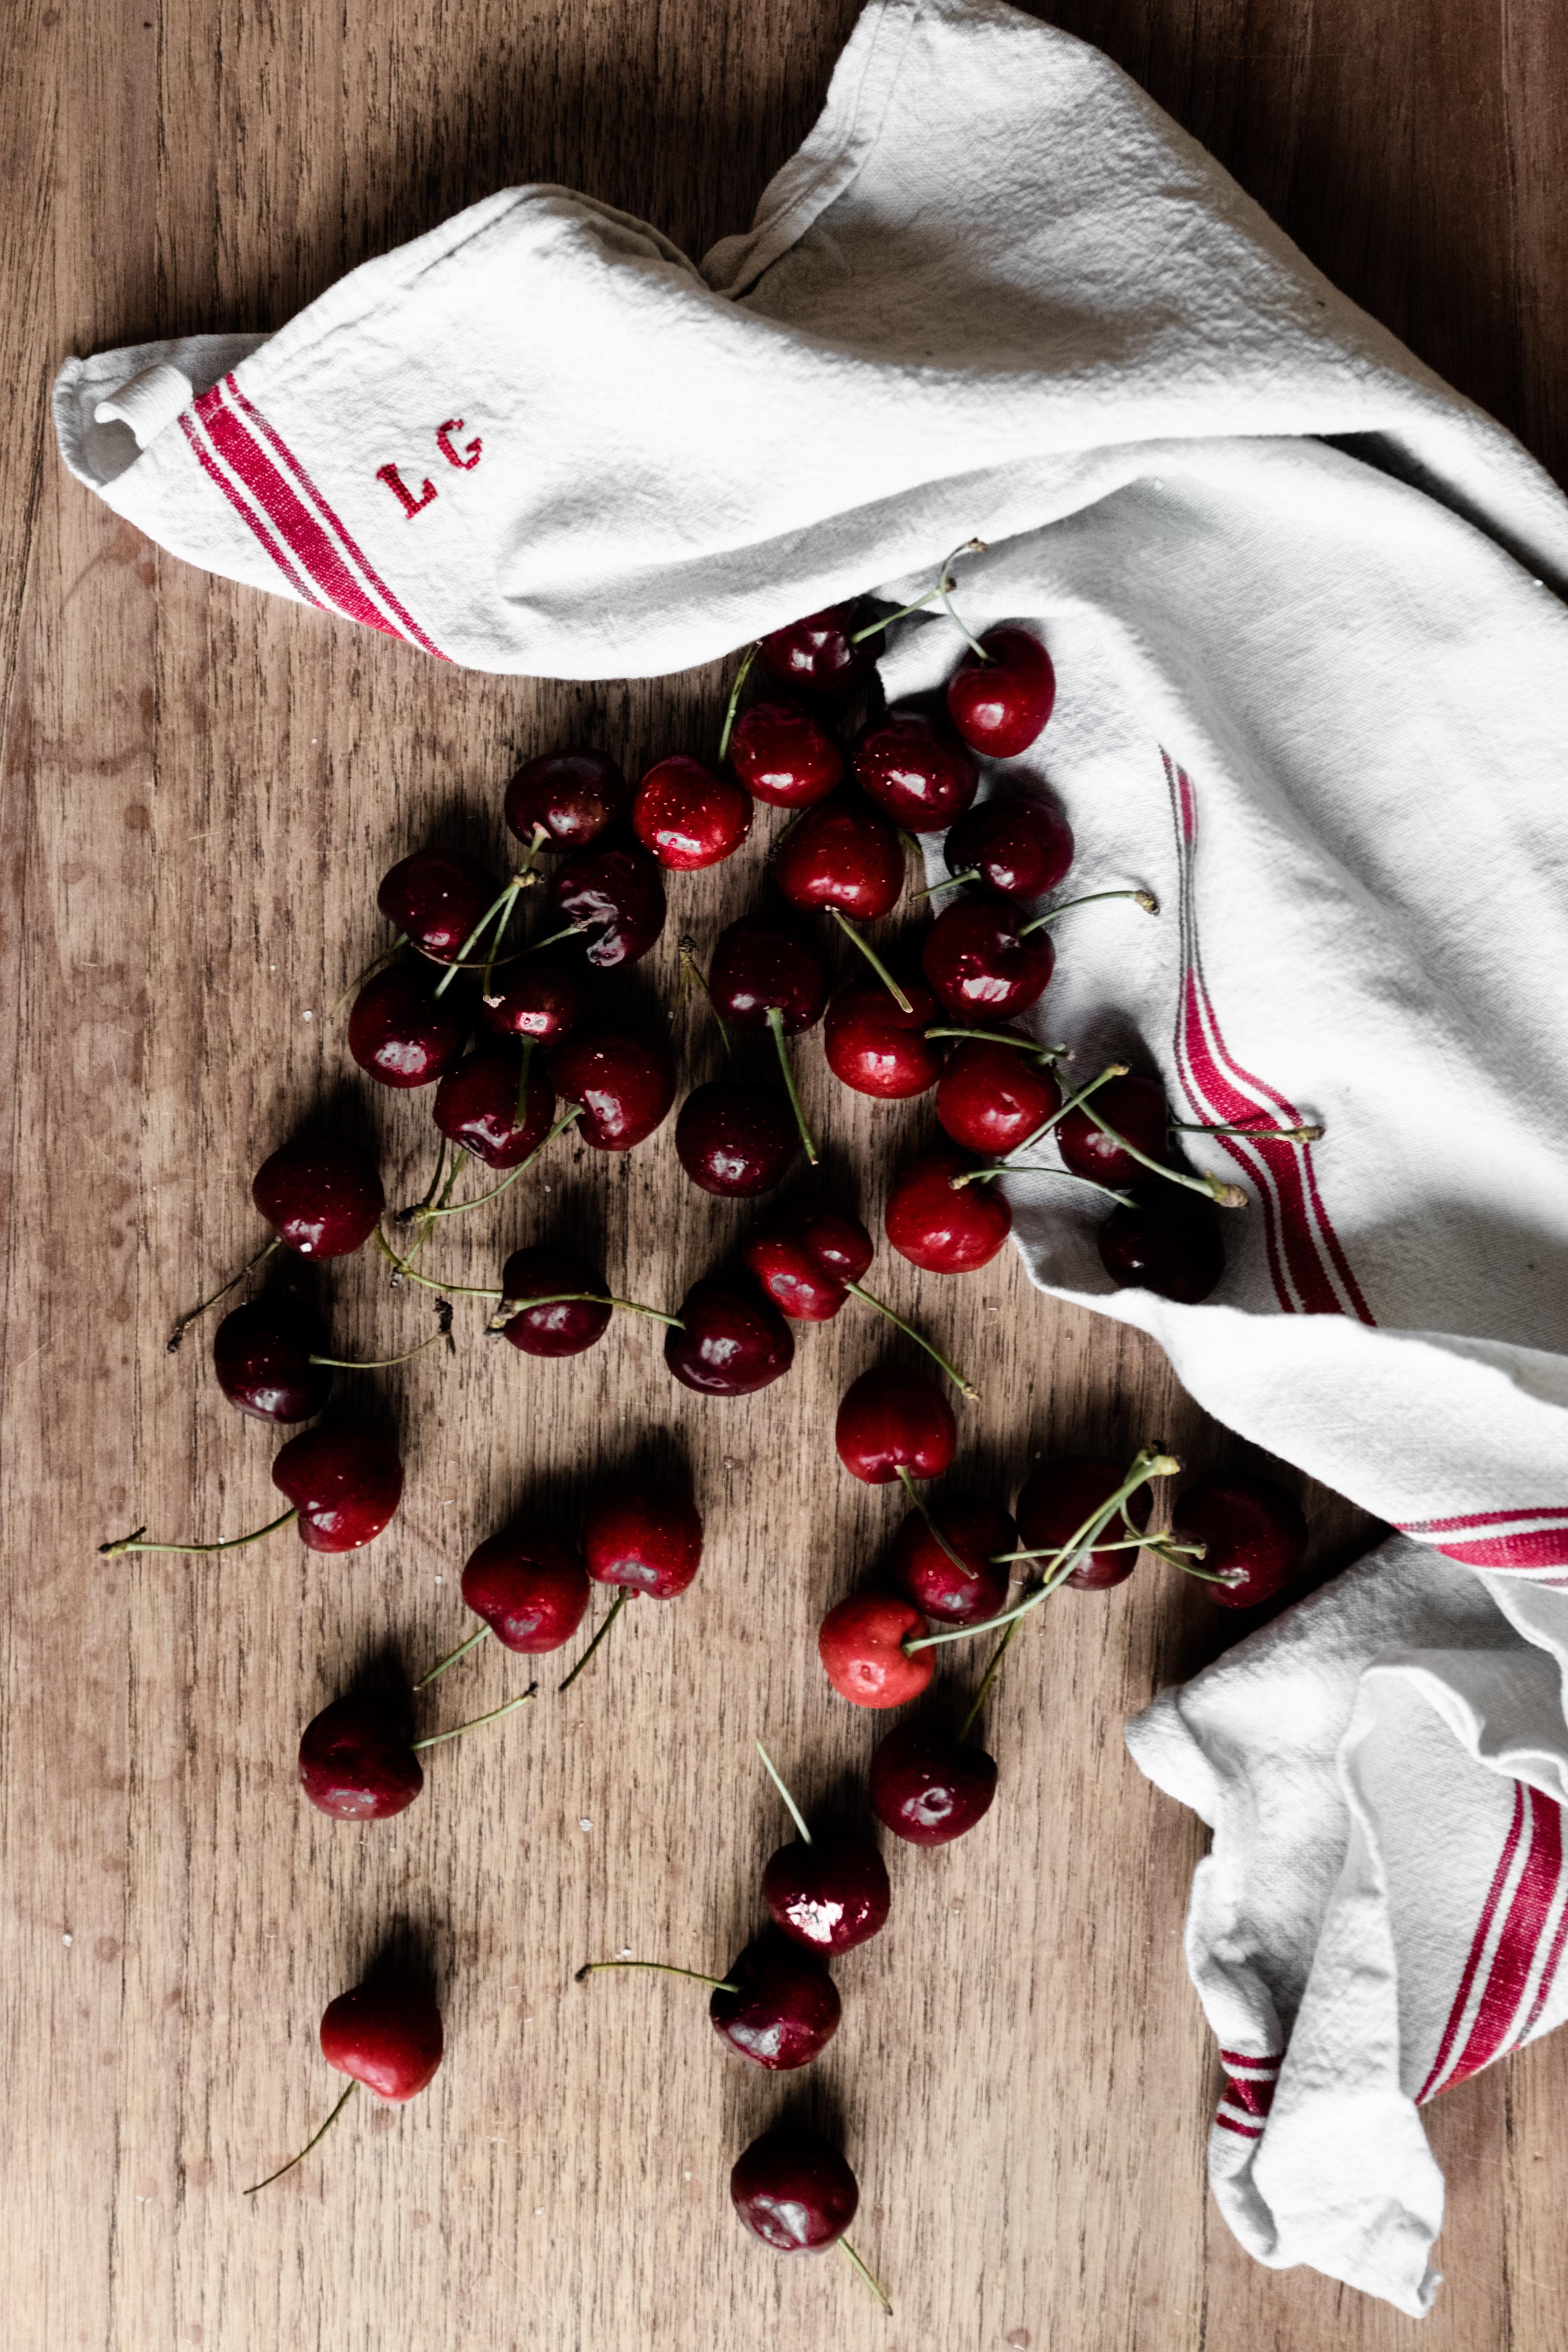 spilled cherries